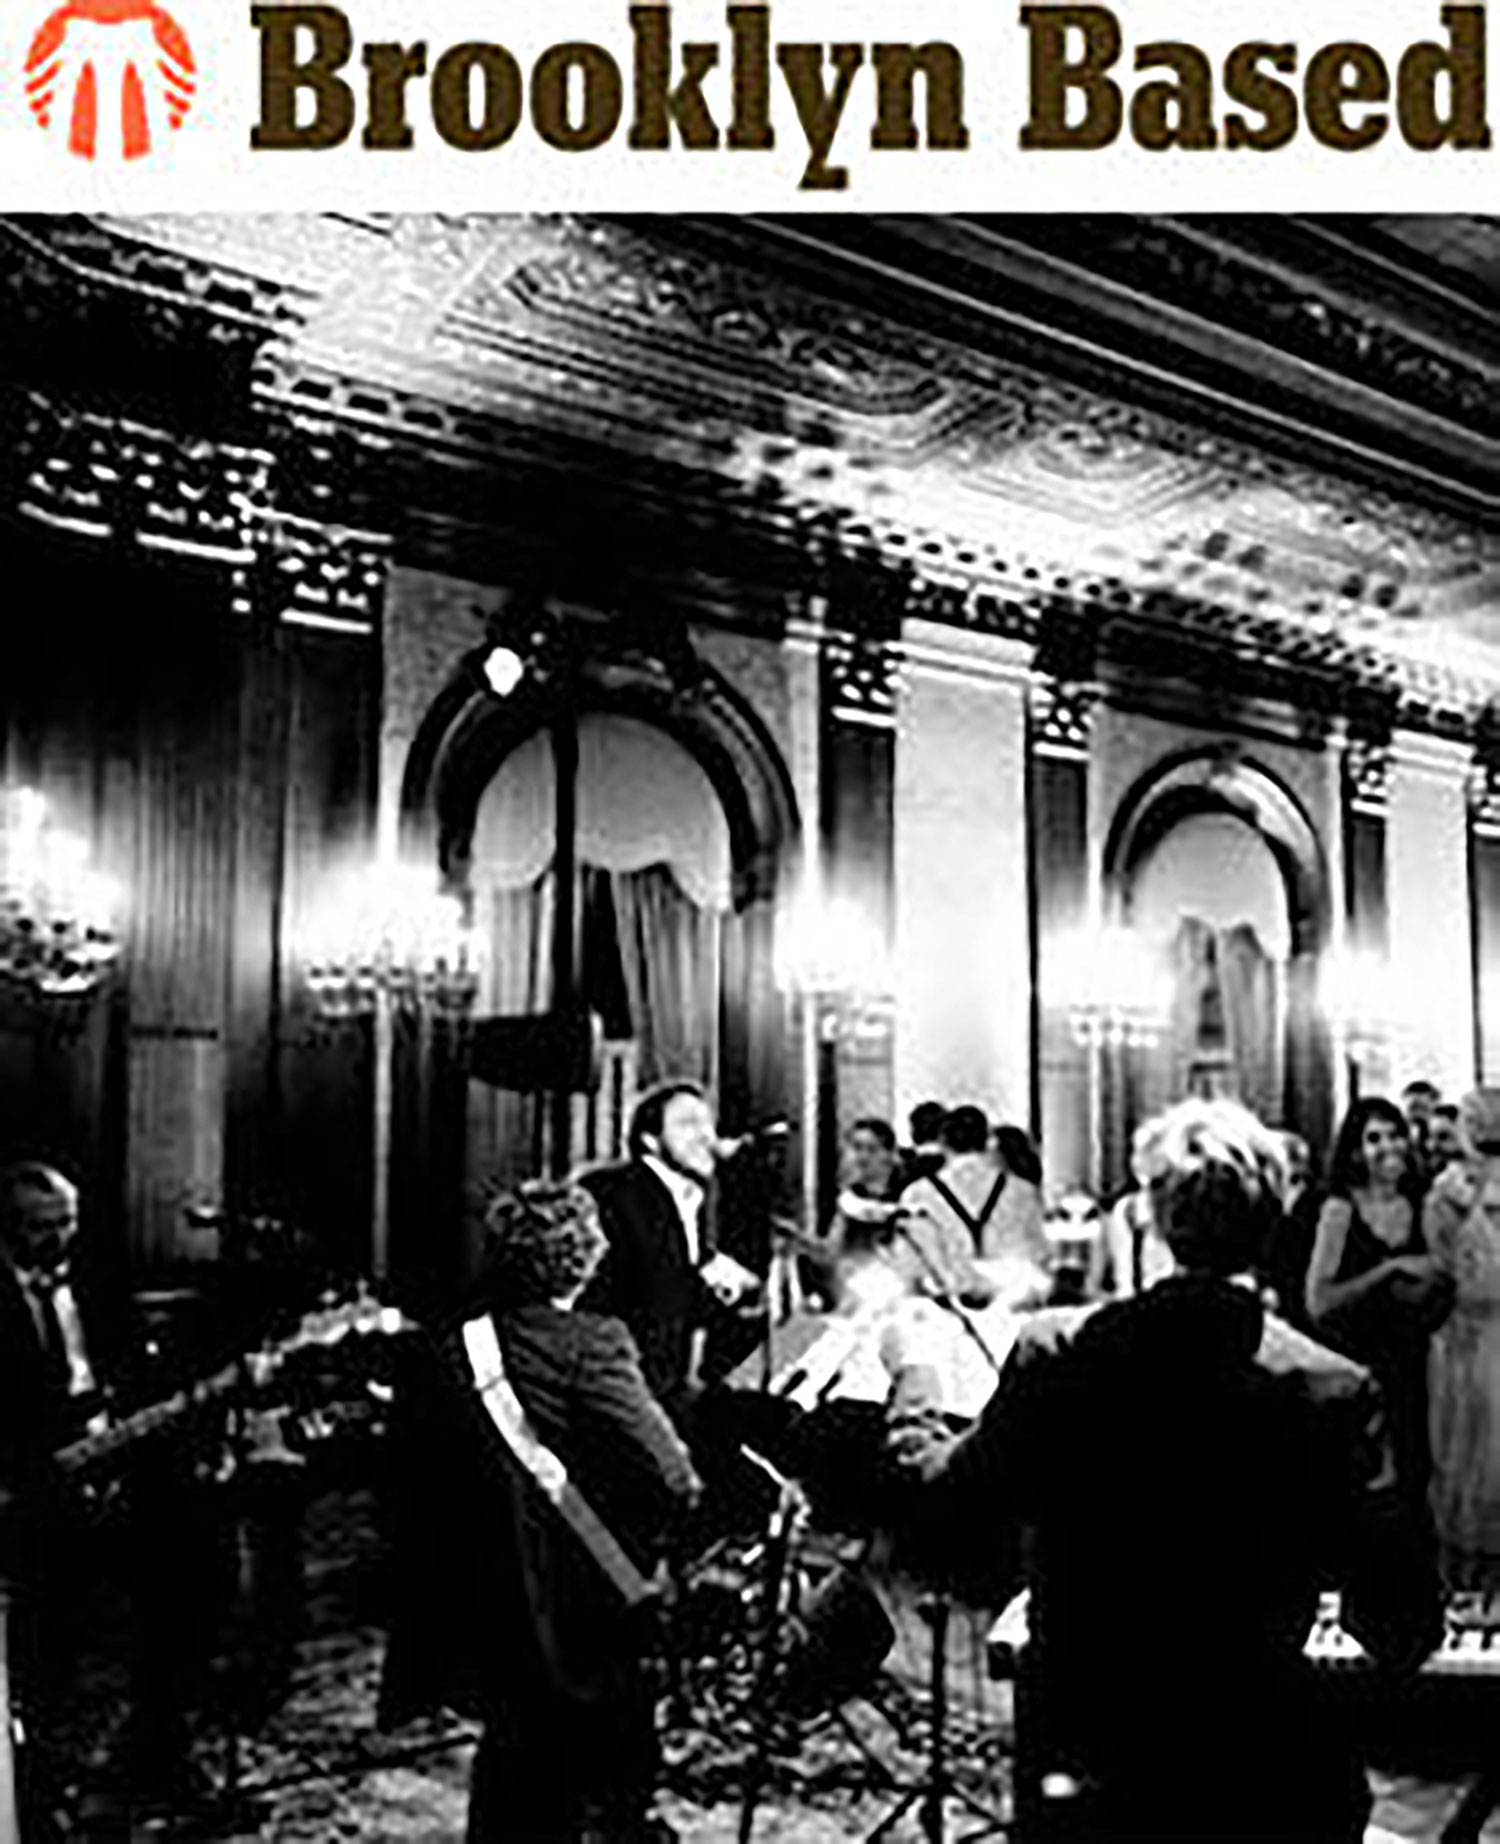 Brooklyn-Based-Dexter-Lake-Club-Band-Antiwedding-Band.jpg